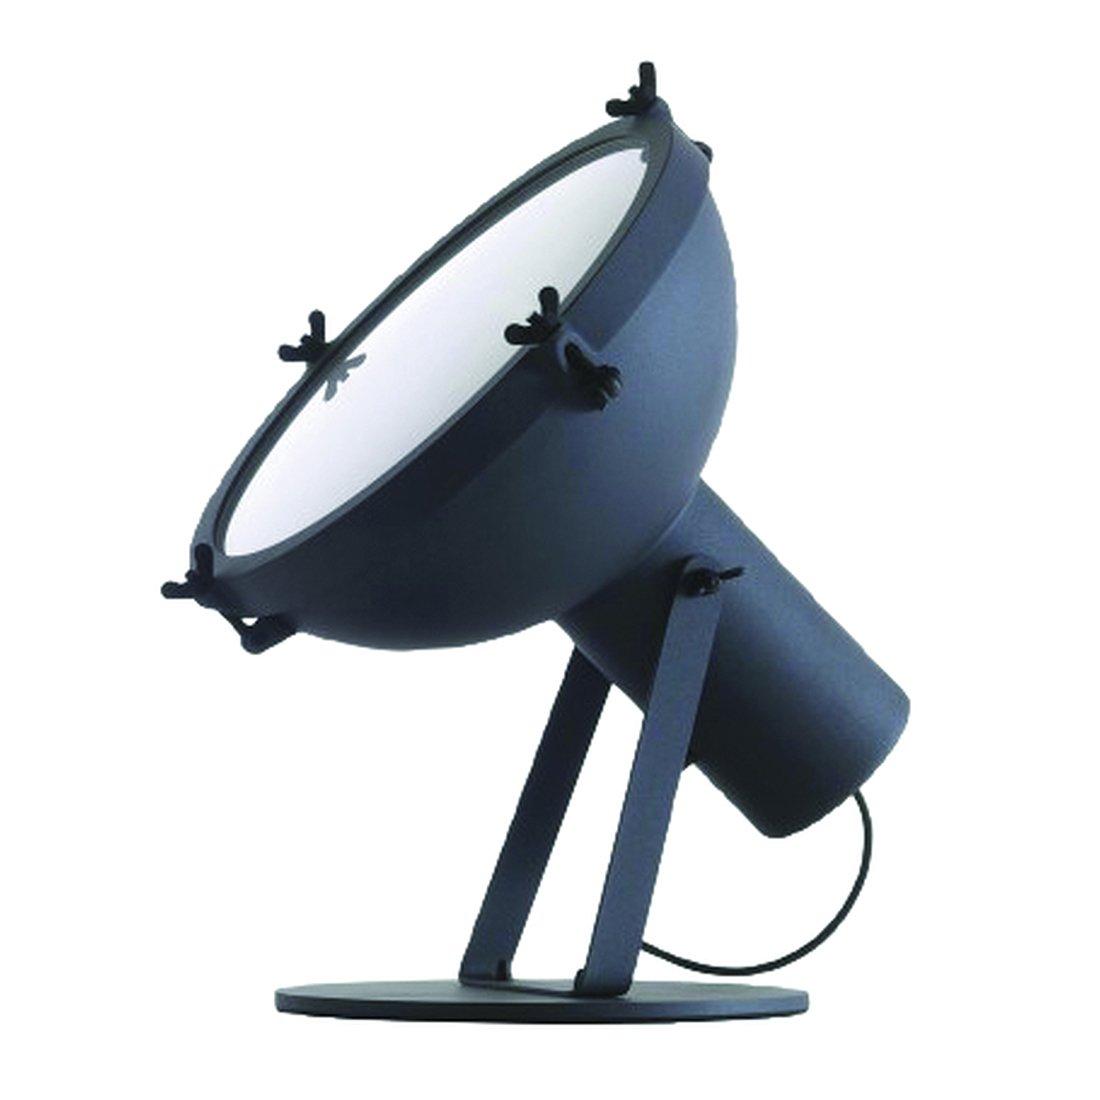 NEMO Projecteur 365 Vloerlamp Tafellamp Night Blue